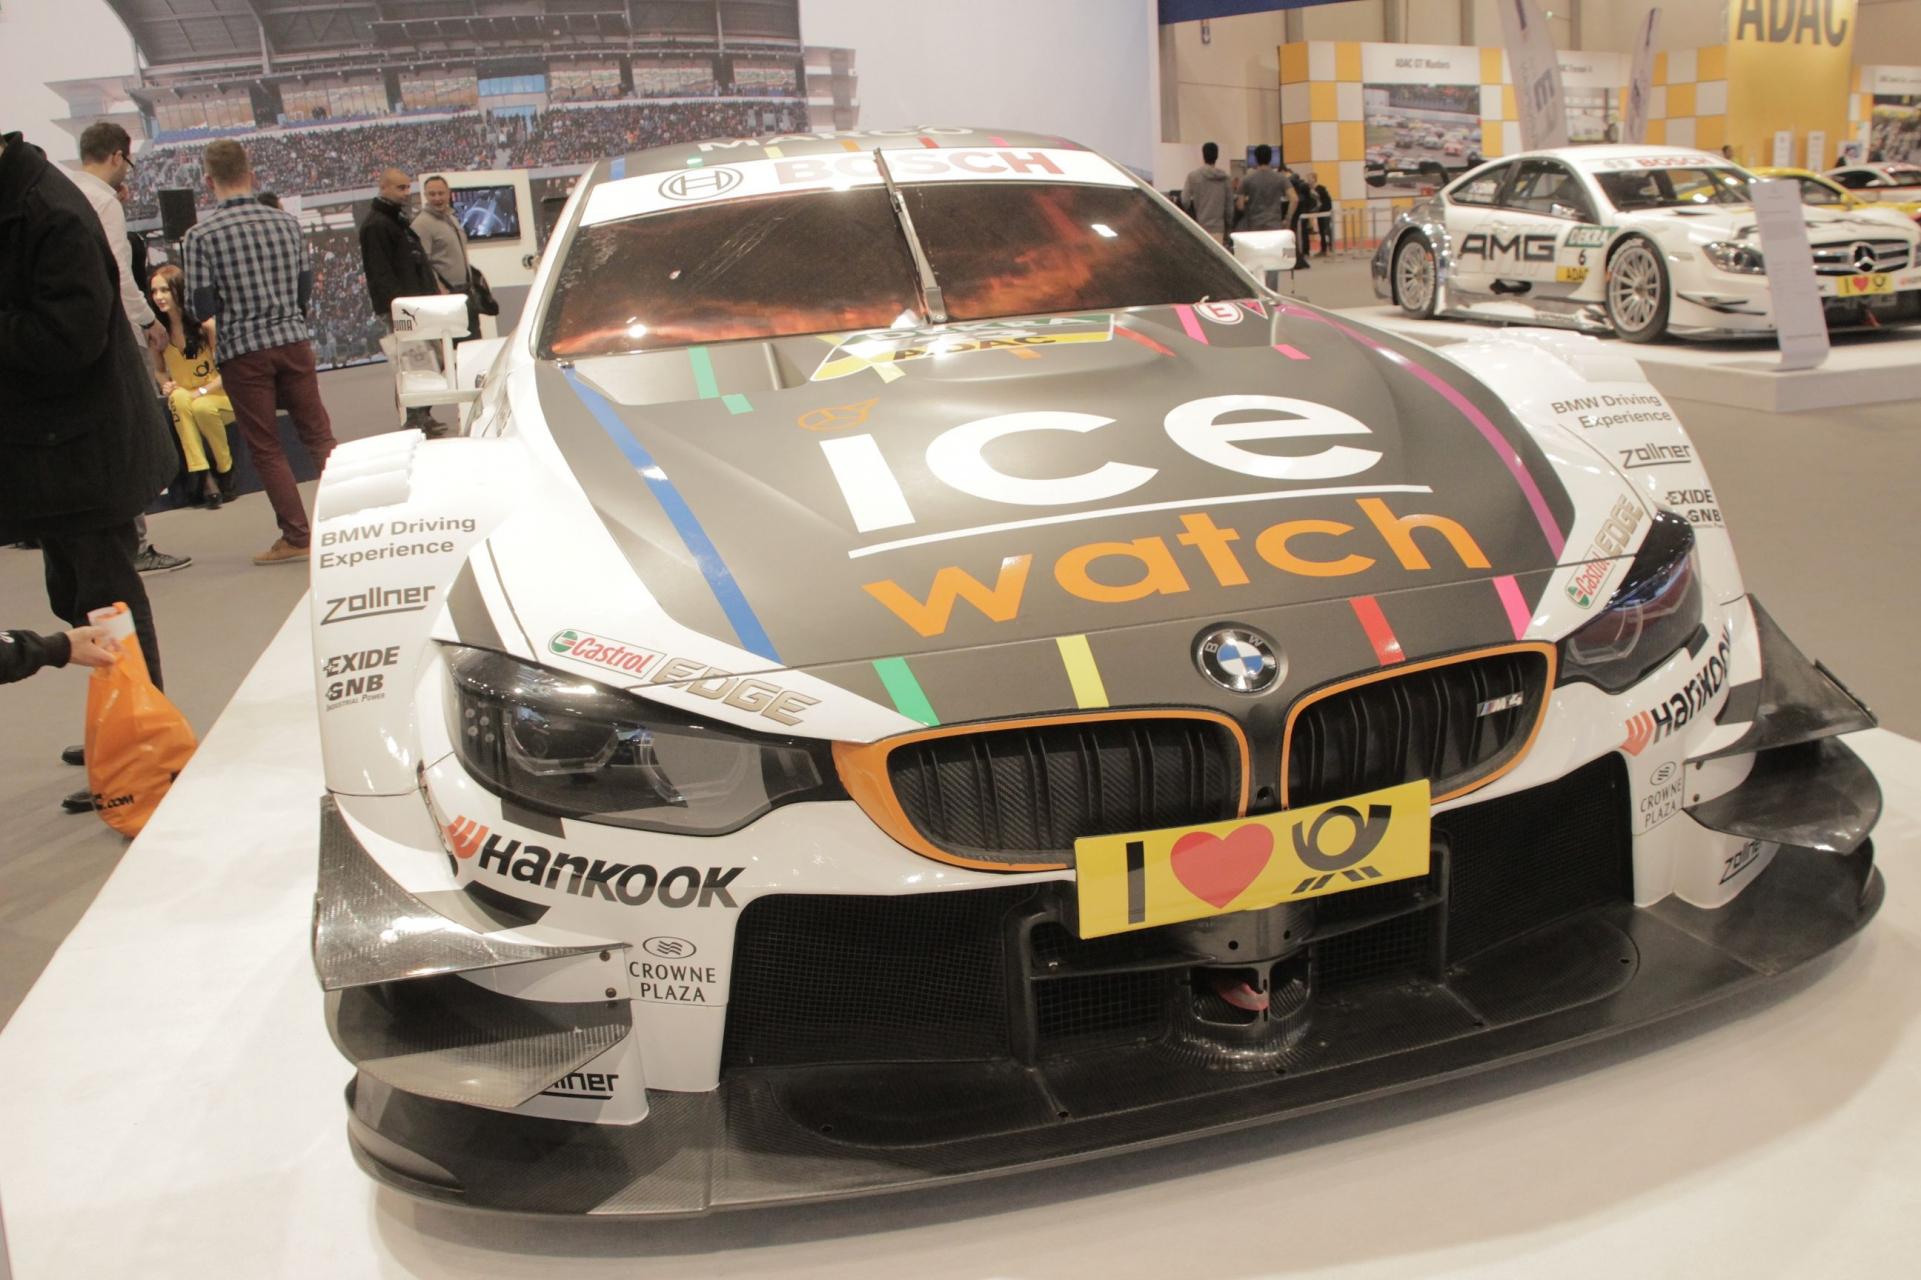 Essen Motor Show 2014 126